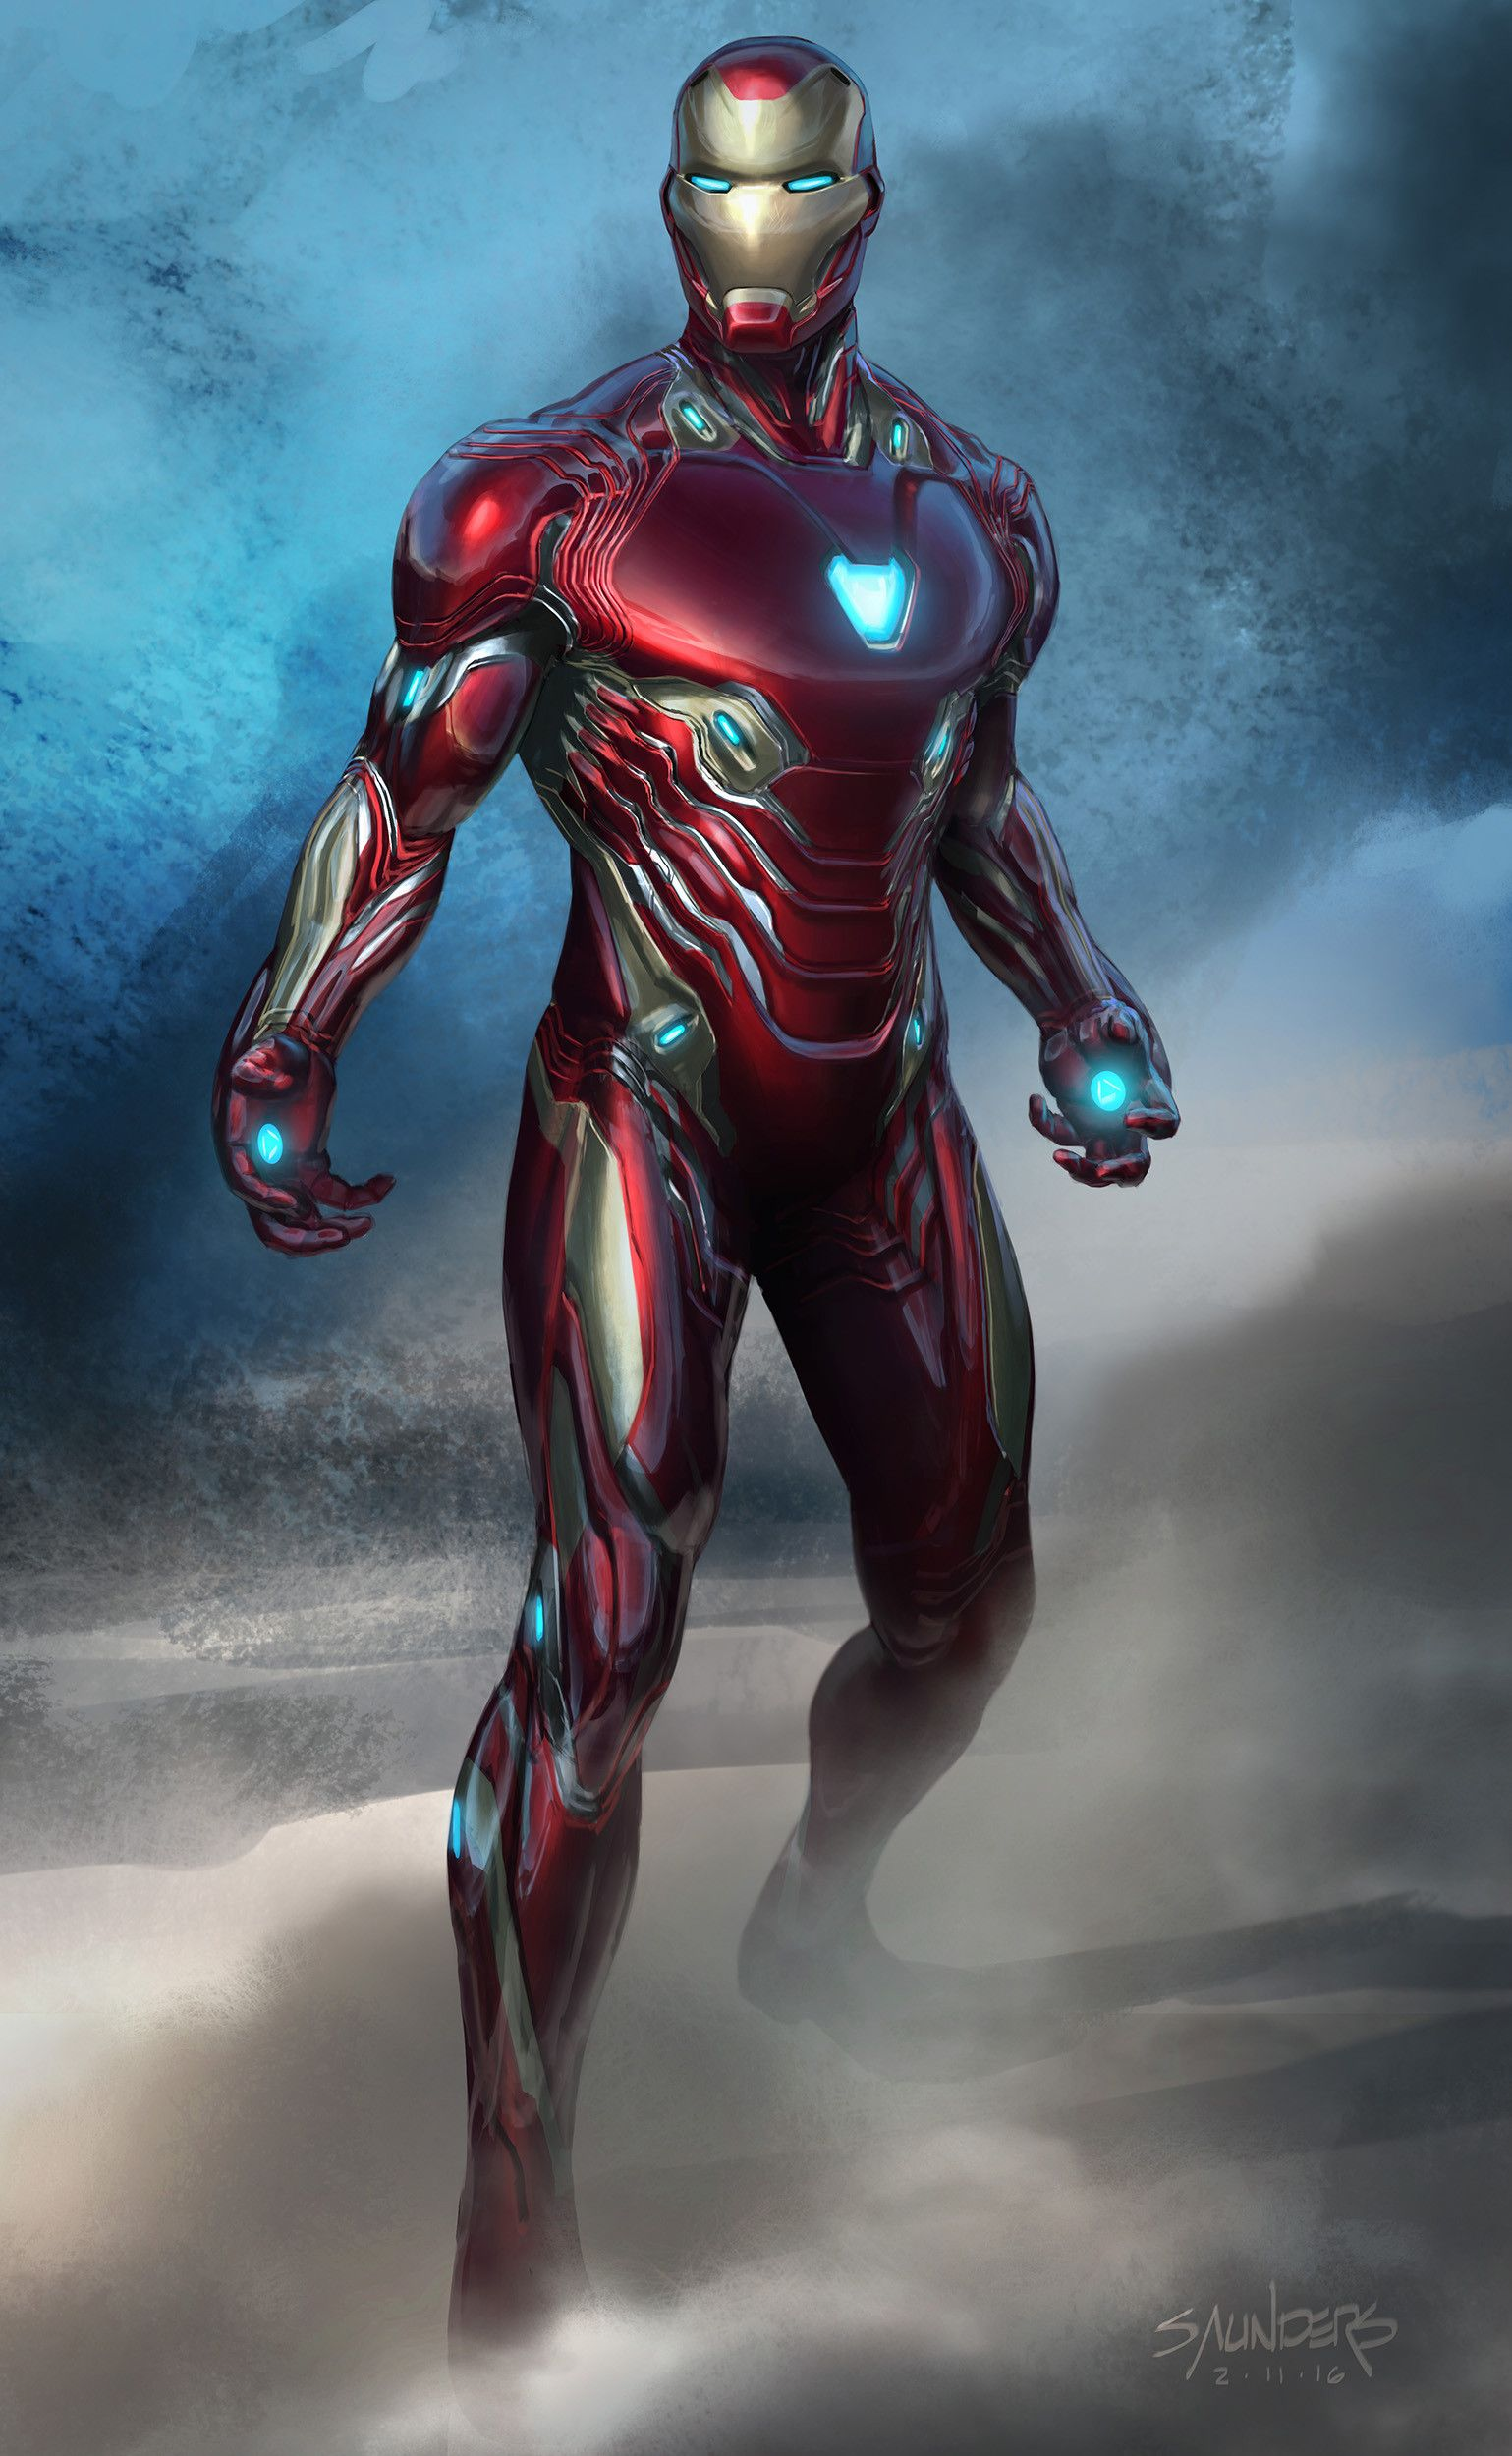 Artstation Avengers Infinity War Iron Man Mk50 Original Sketch Phil Saunders Iron Man Movie Iron Man Art Marvel Iron Man